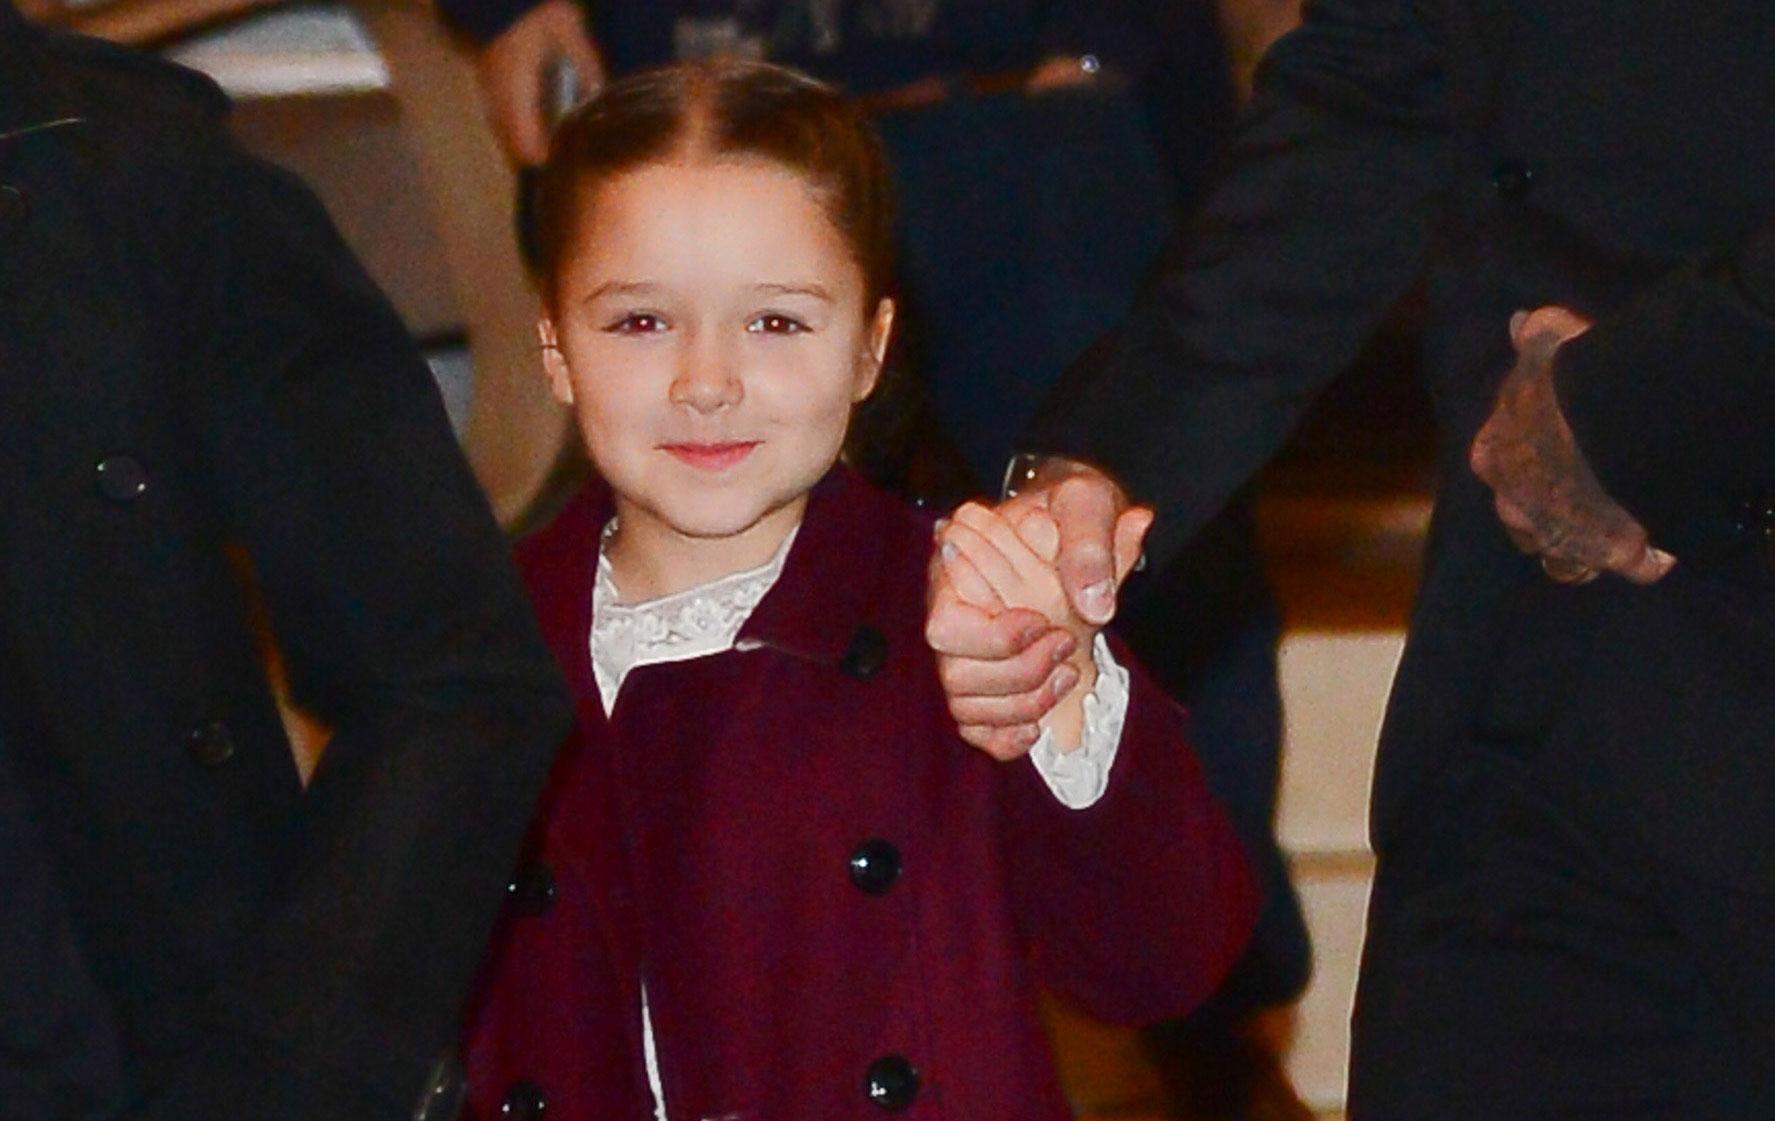 Harper Beckham Enjoyed A Lavish Birthday Party But Her